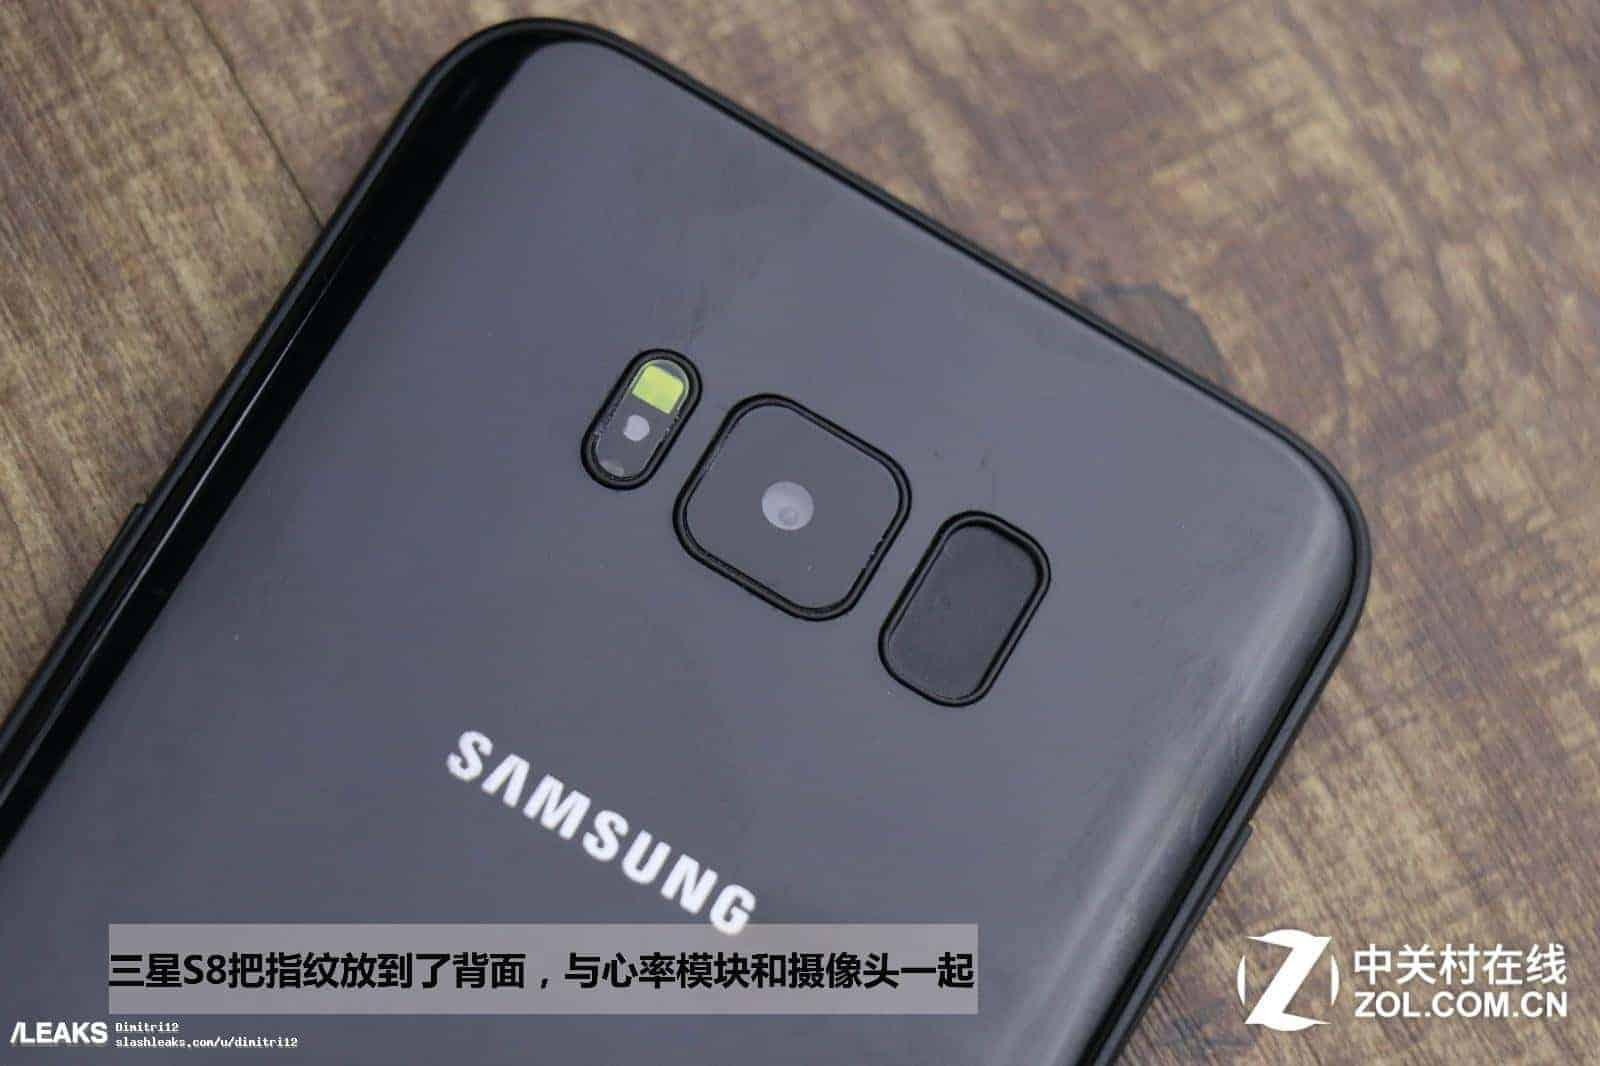 Galaxy S8 hands on video screenshot leak 1